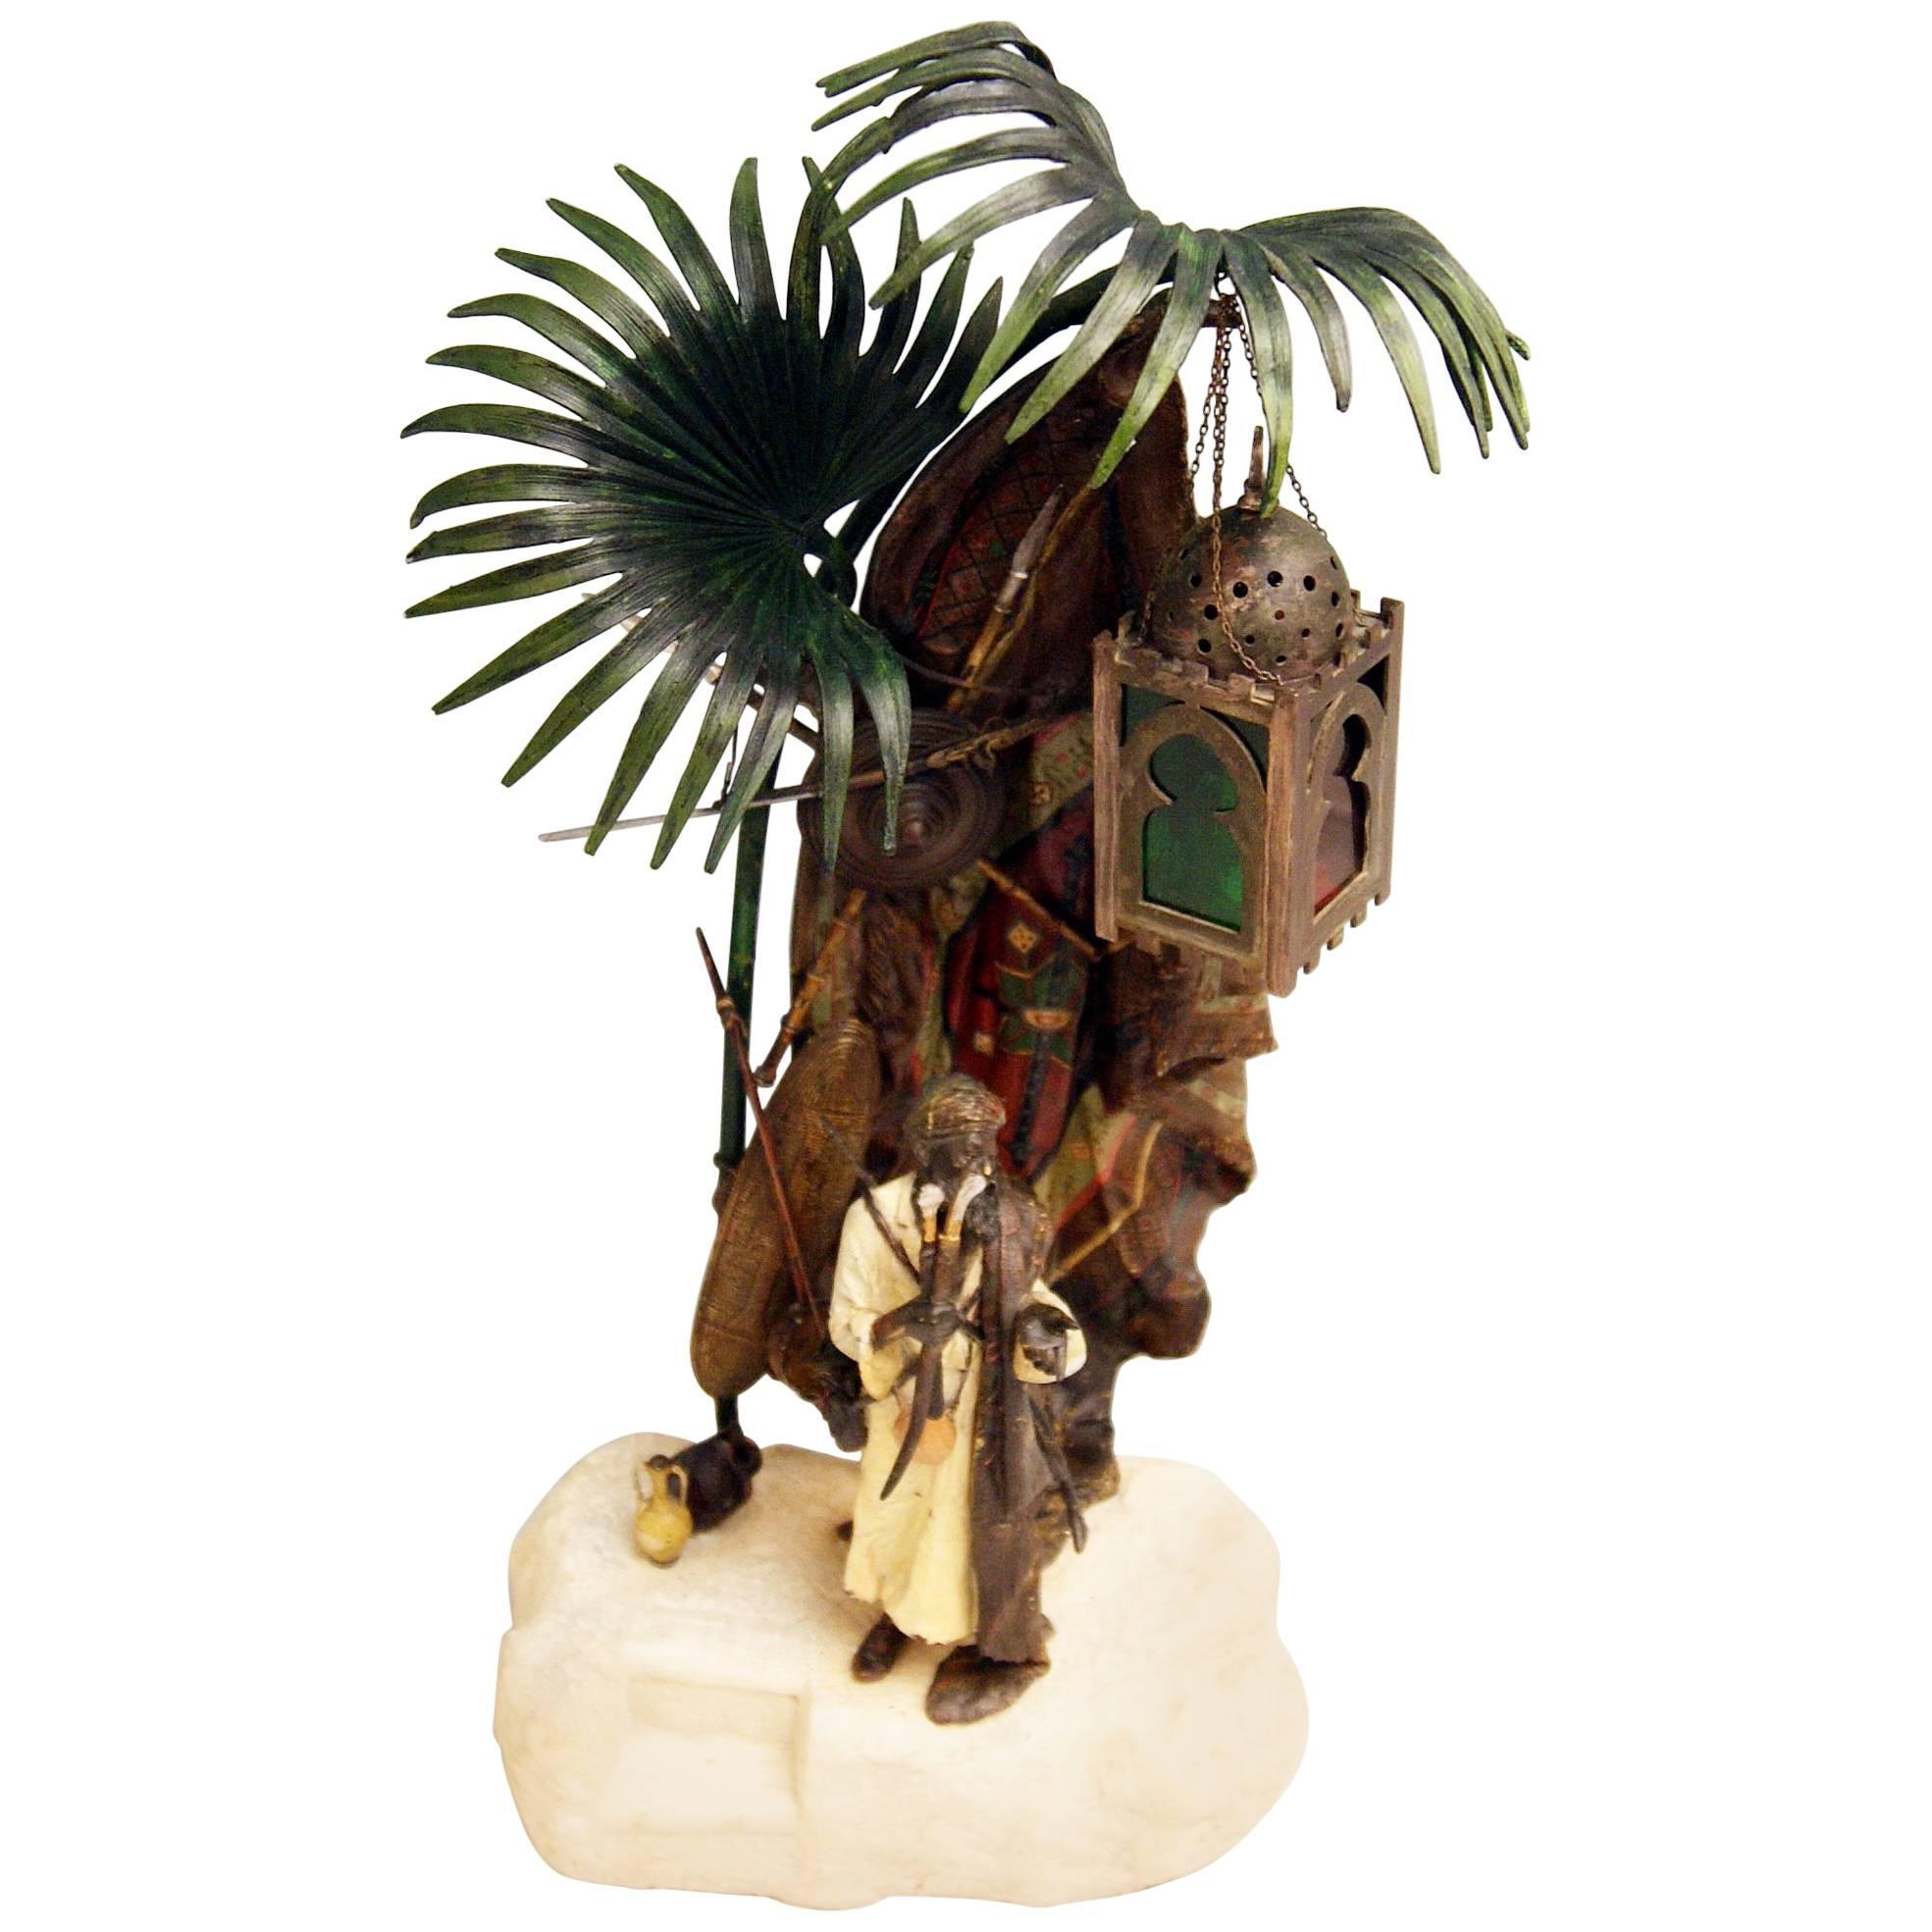 Vienna Bergmann Bronze Lamp Arab Man with Carpet made circa 1910